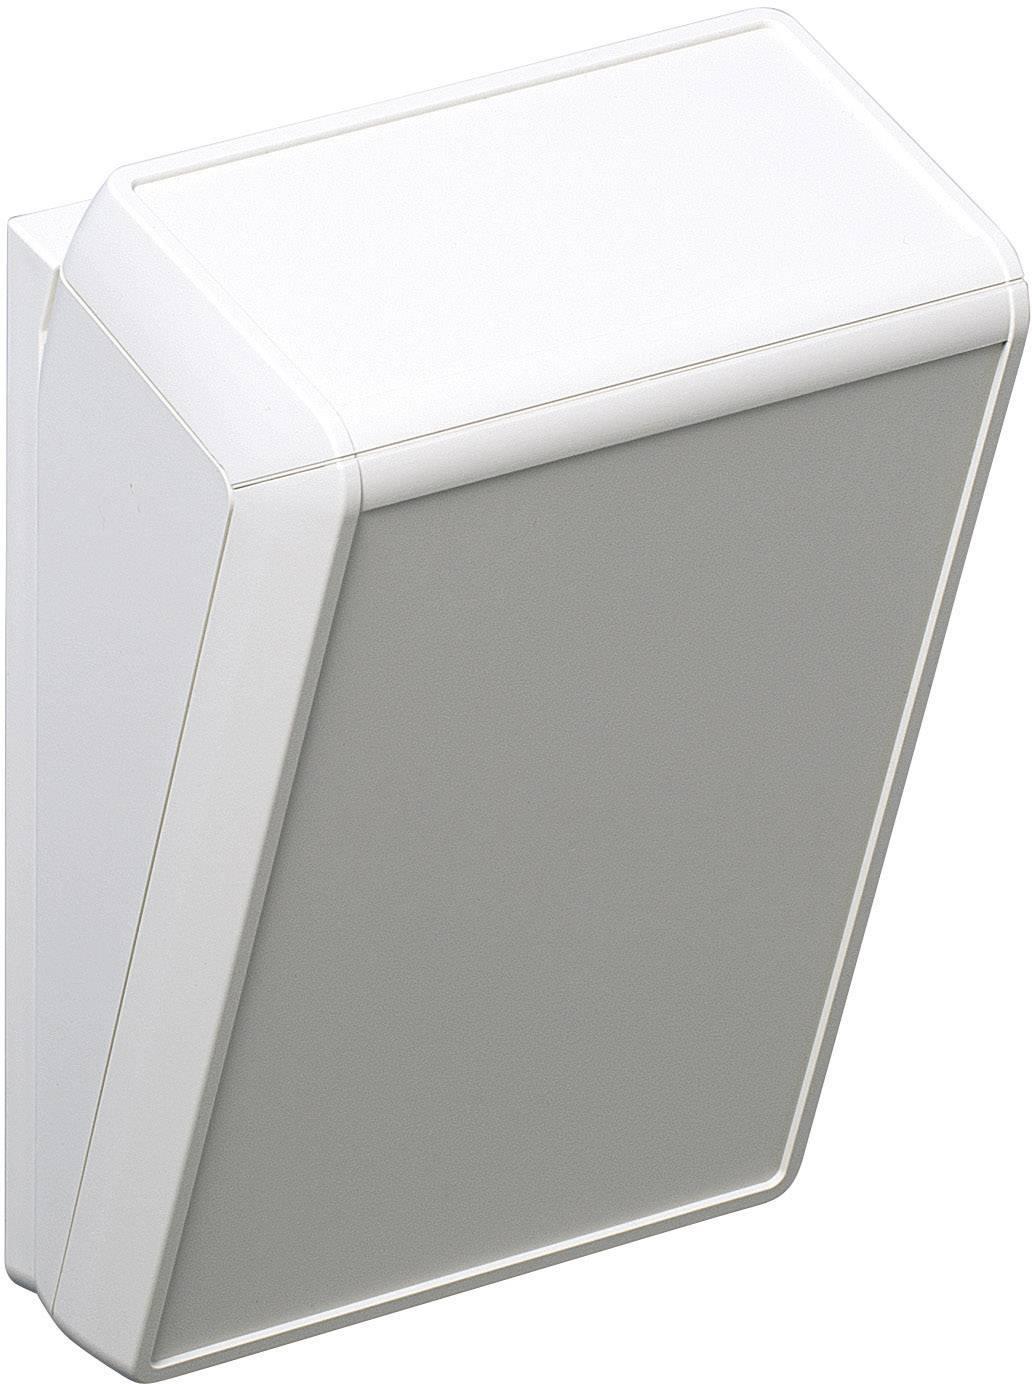 Pultové pouzdro ABS OKW D4056117, (d x š x v) 148 x 210 x 90/35 mm, šedá